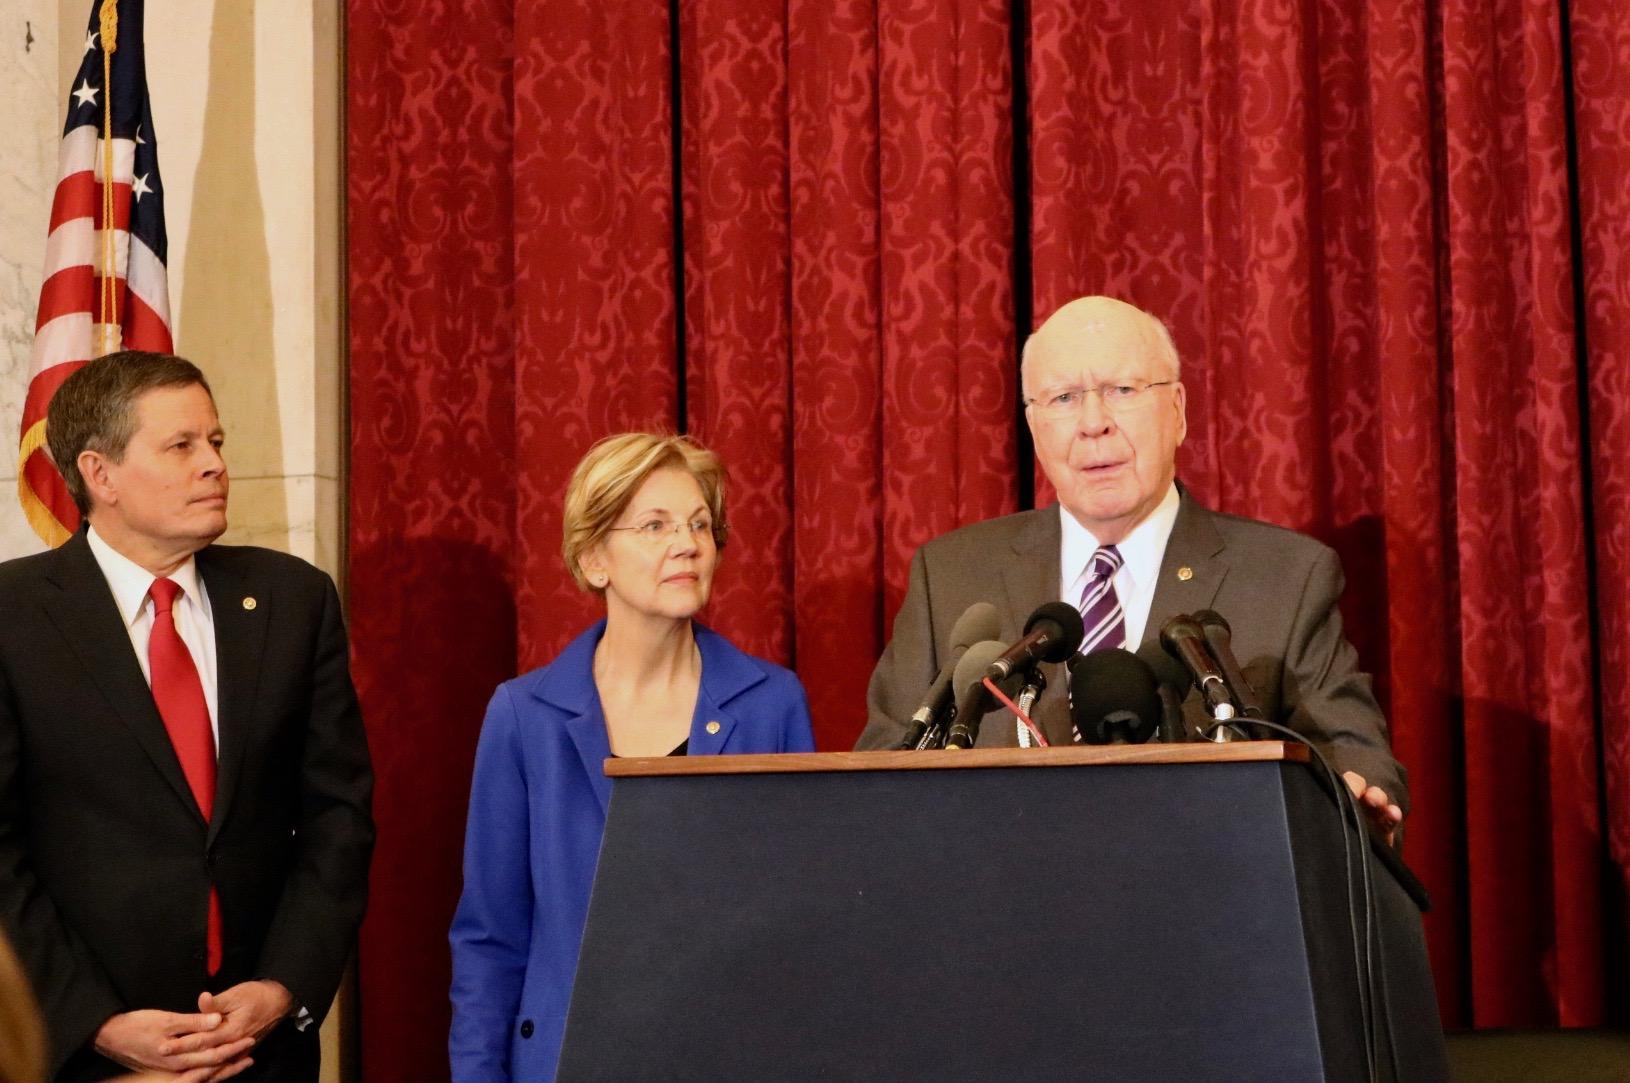 Legislation on foreign surveillance clears Senate hurdle